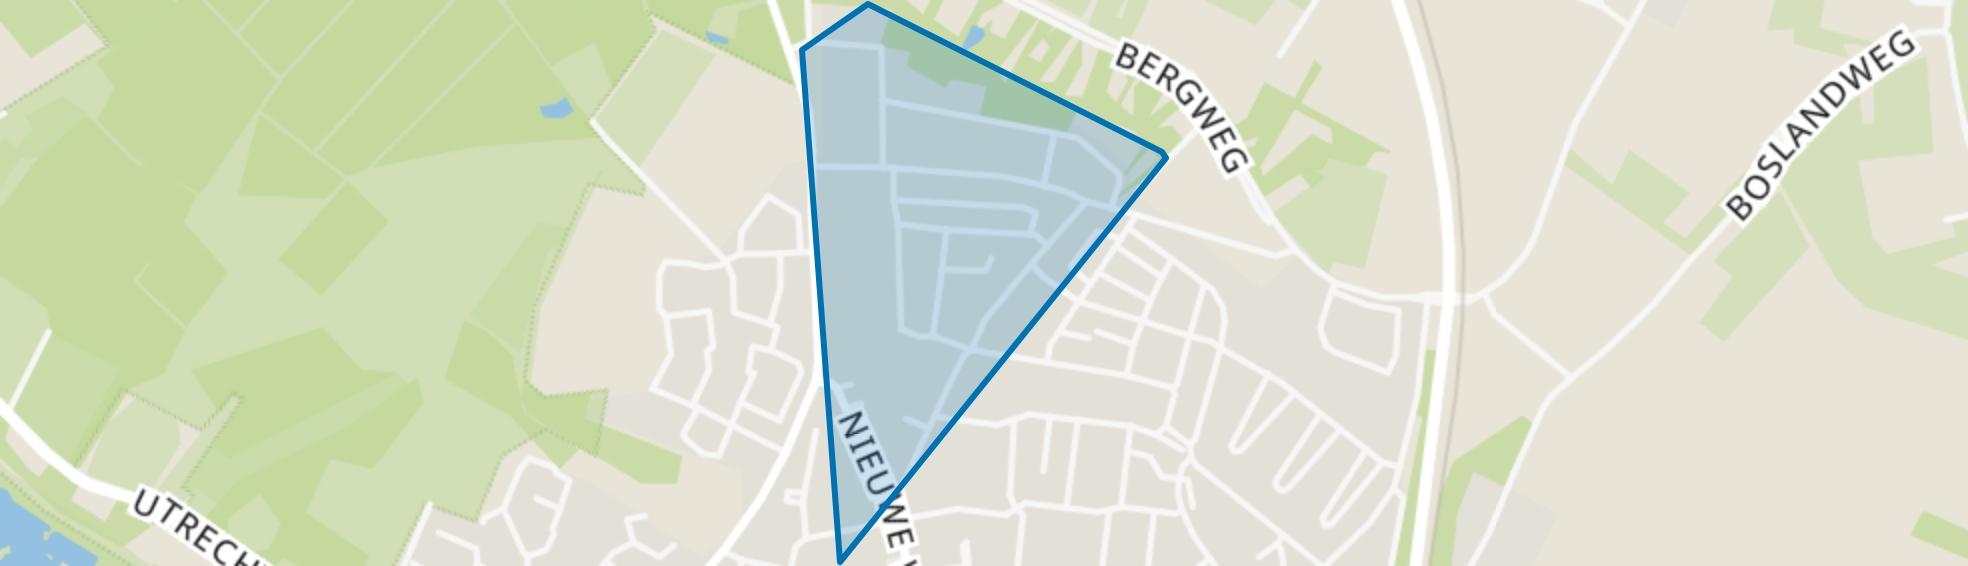 Domineesberg, Rhenen map